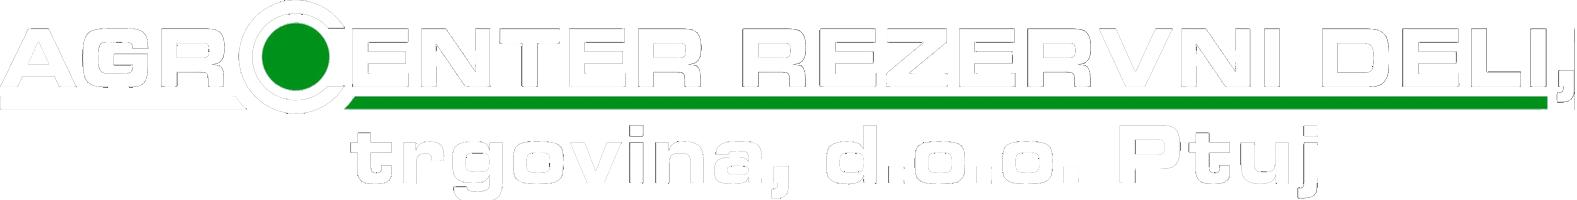 {logo_alt}